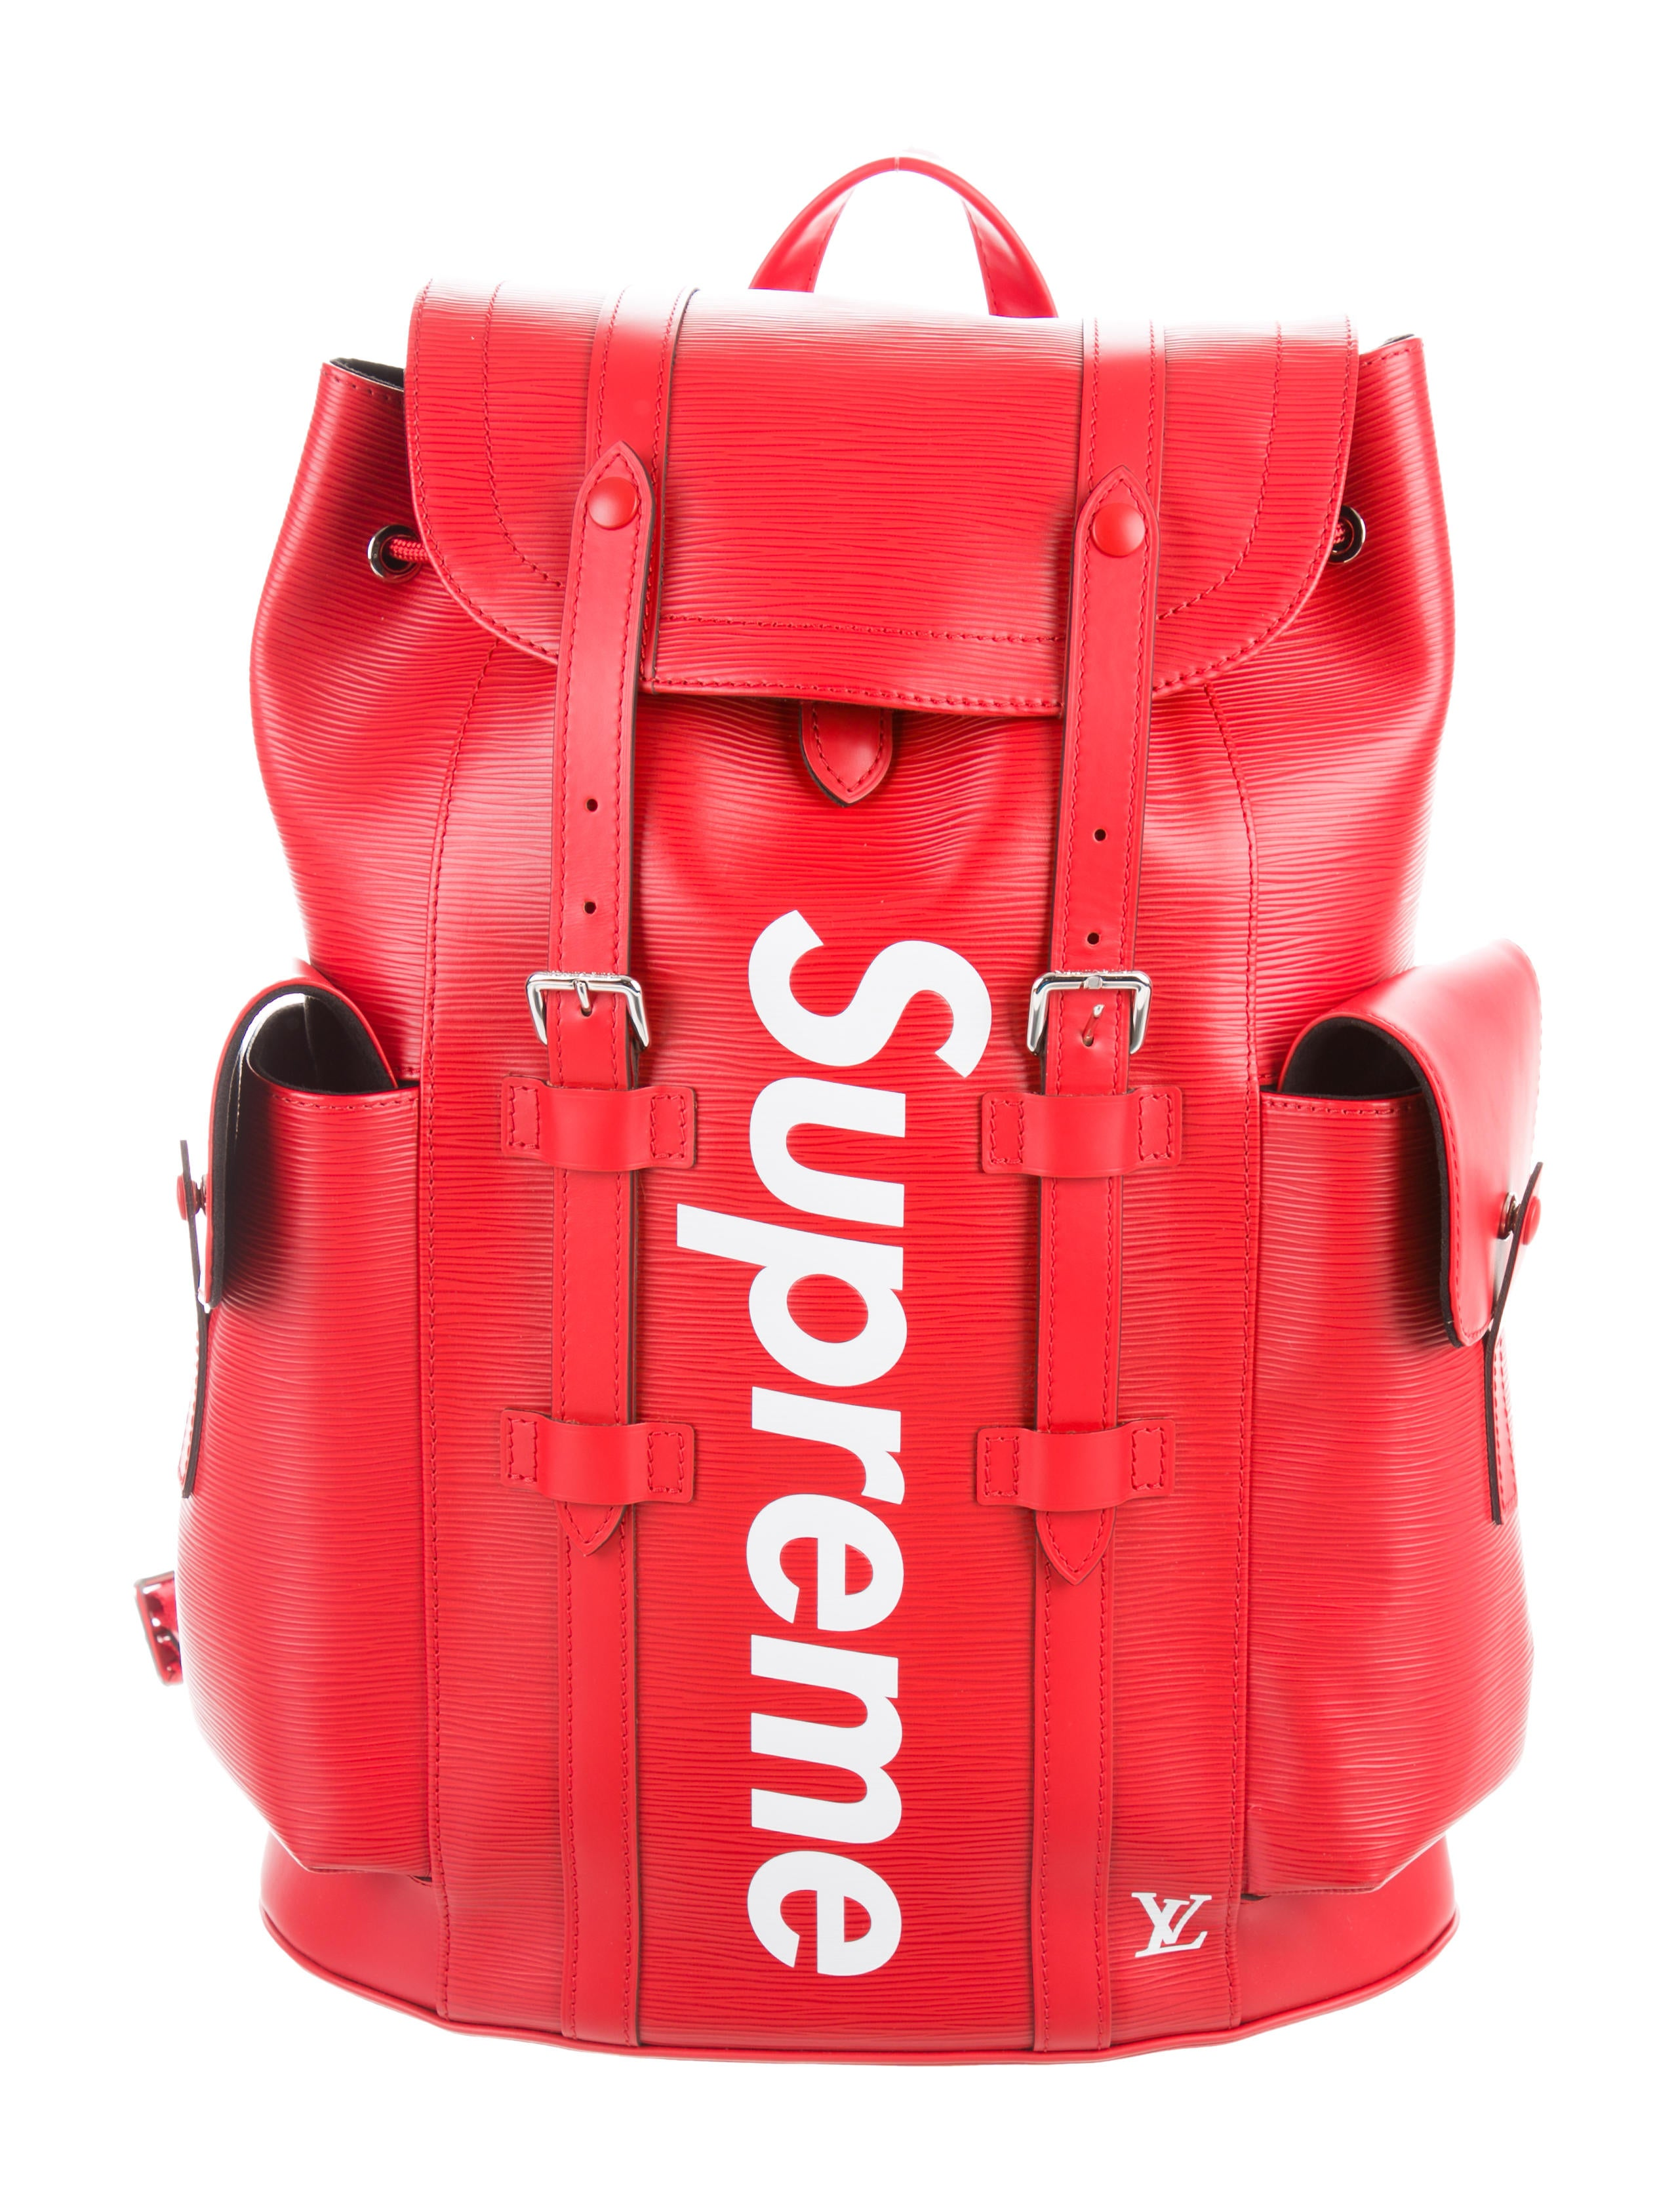 99d15a5341eb Louis Vuitton x Supreme 2017 Epi Christopher Backpack - Bags ...